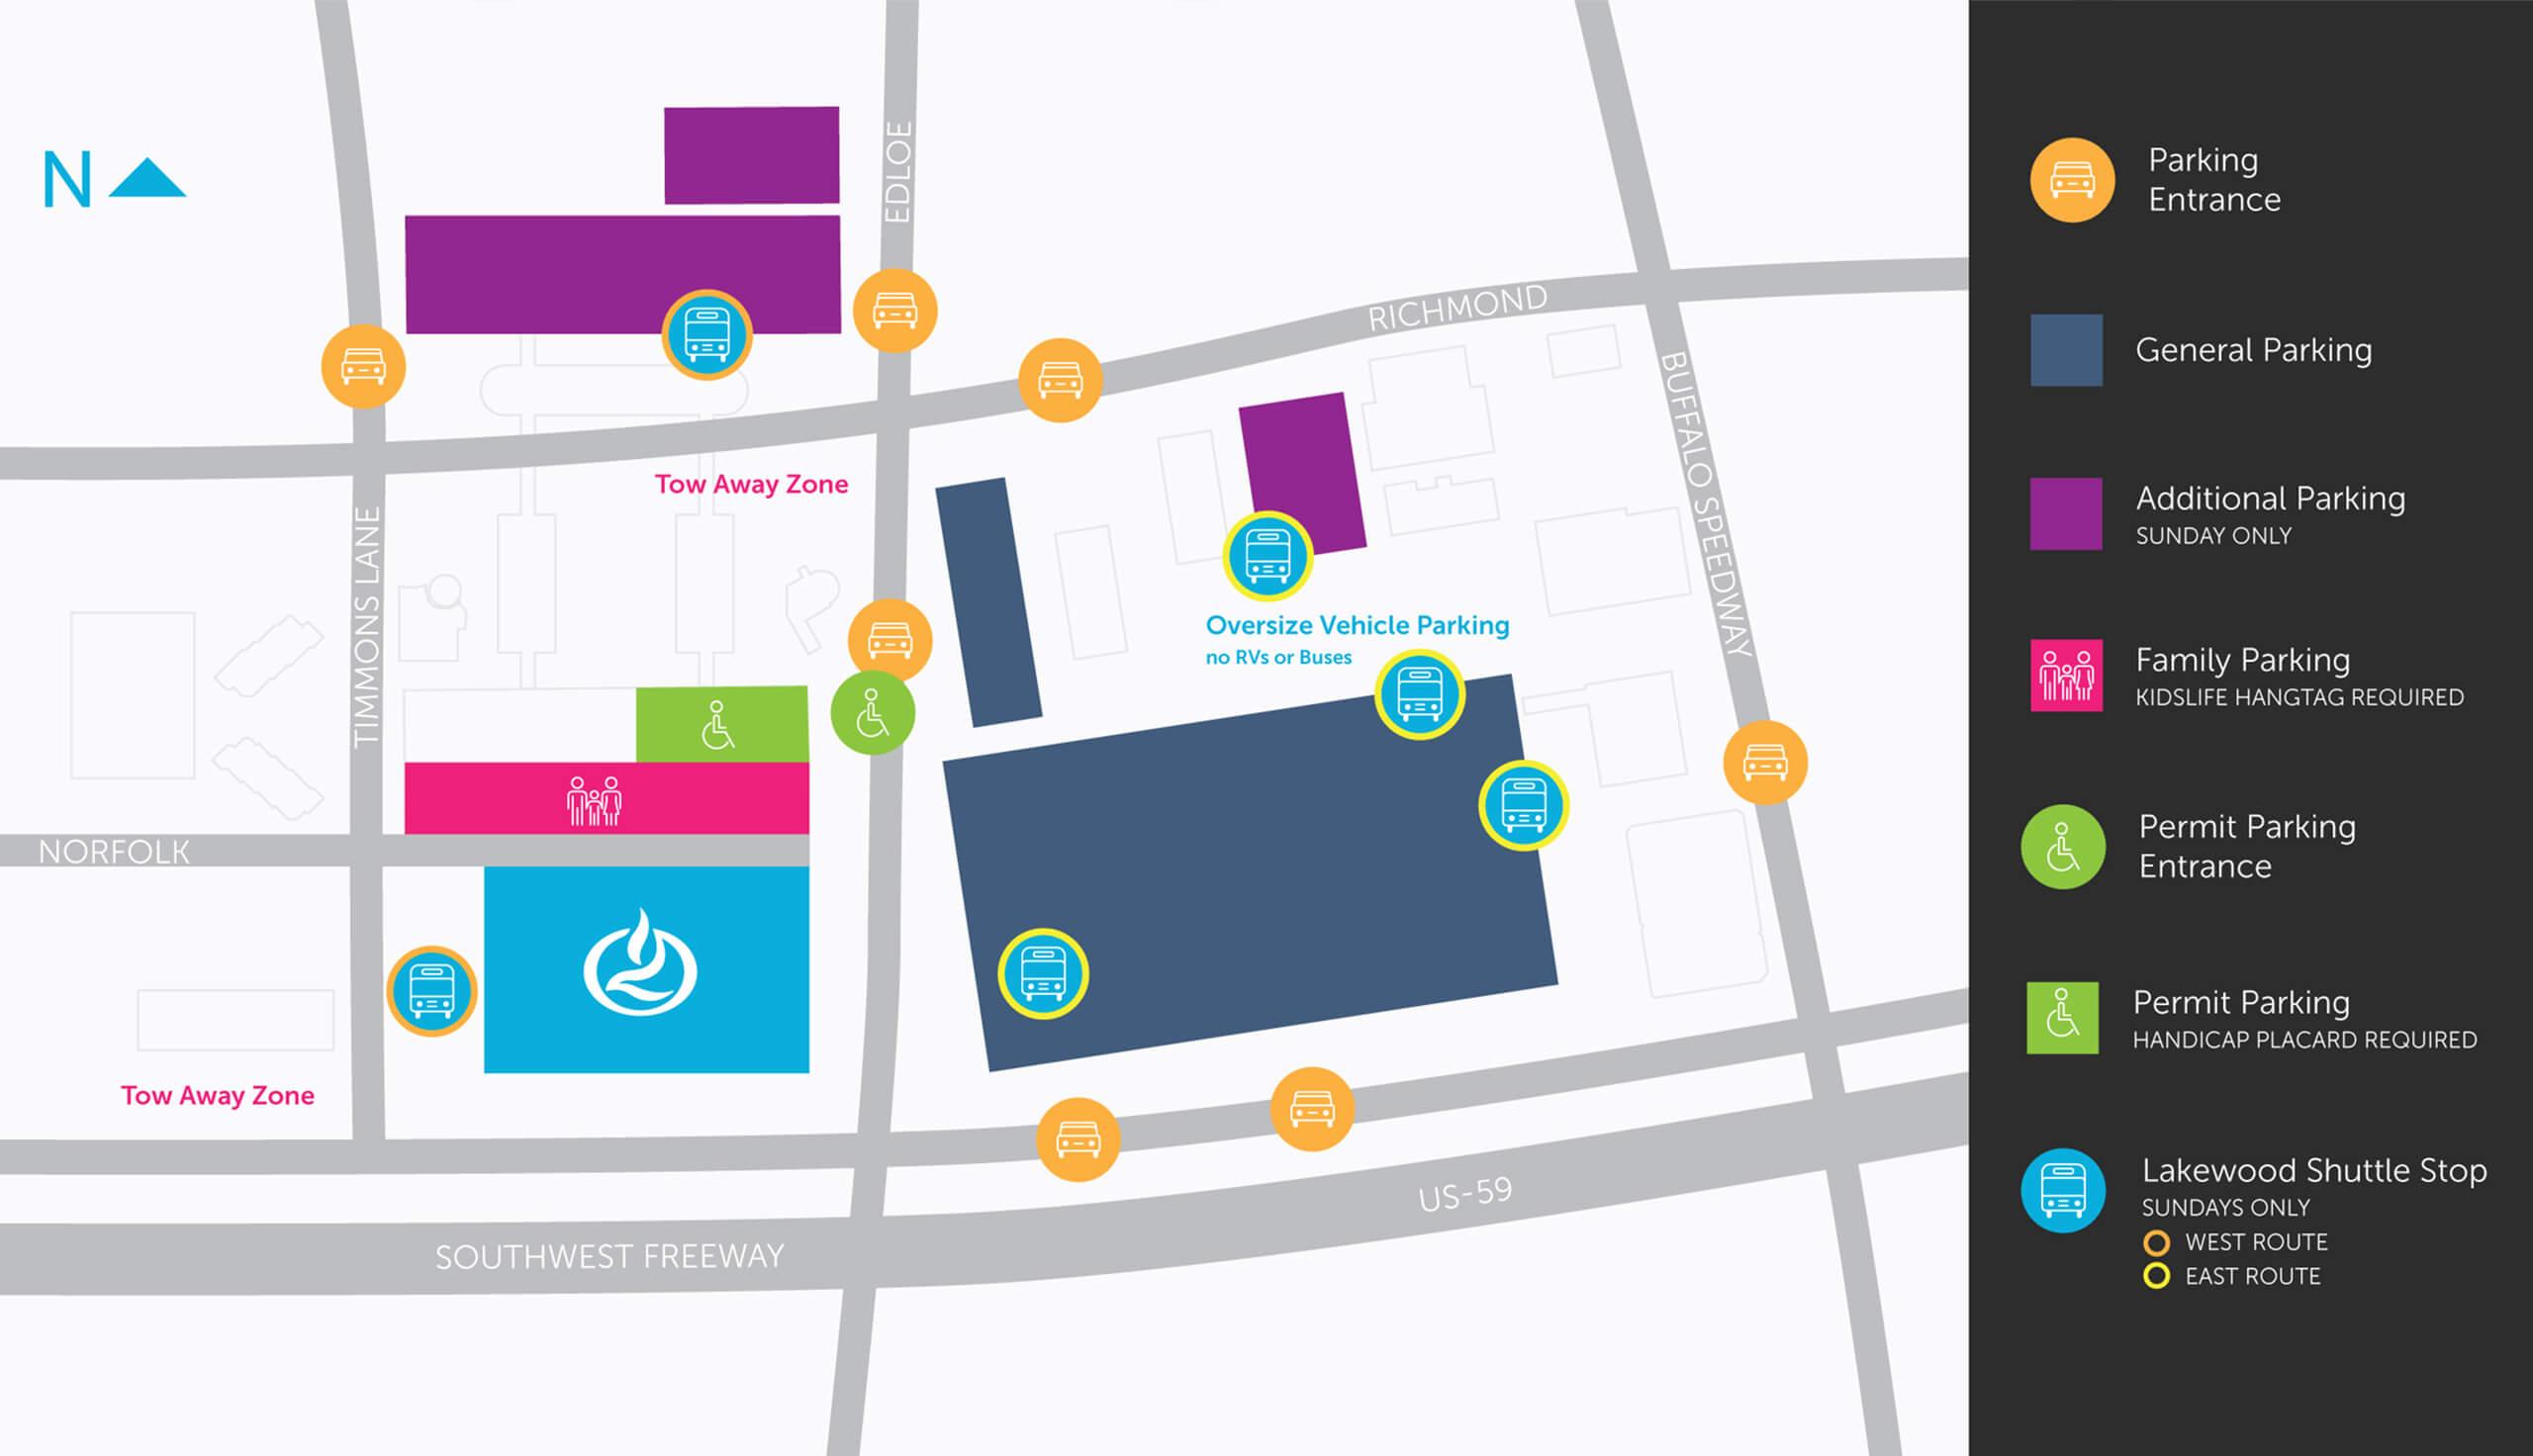 Lakewood Church Parking Guide